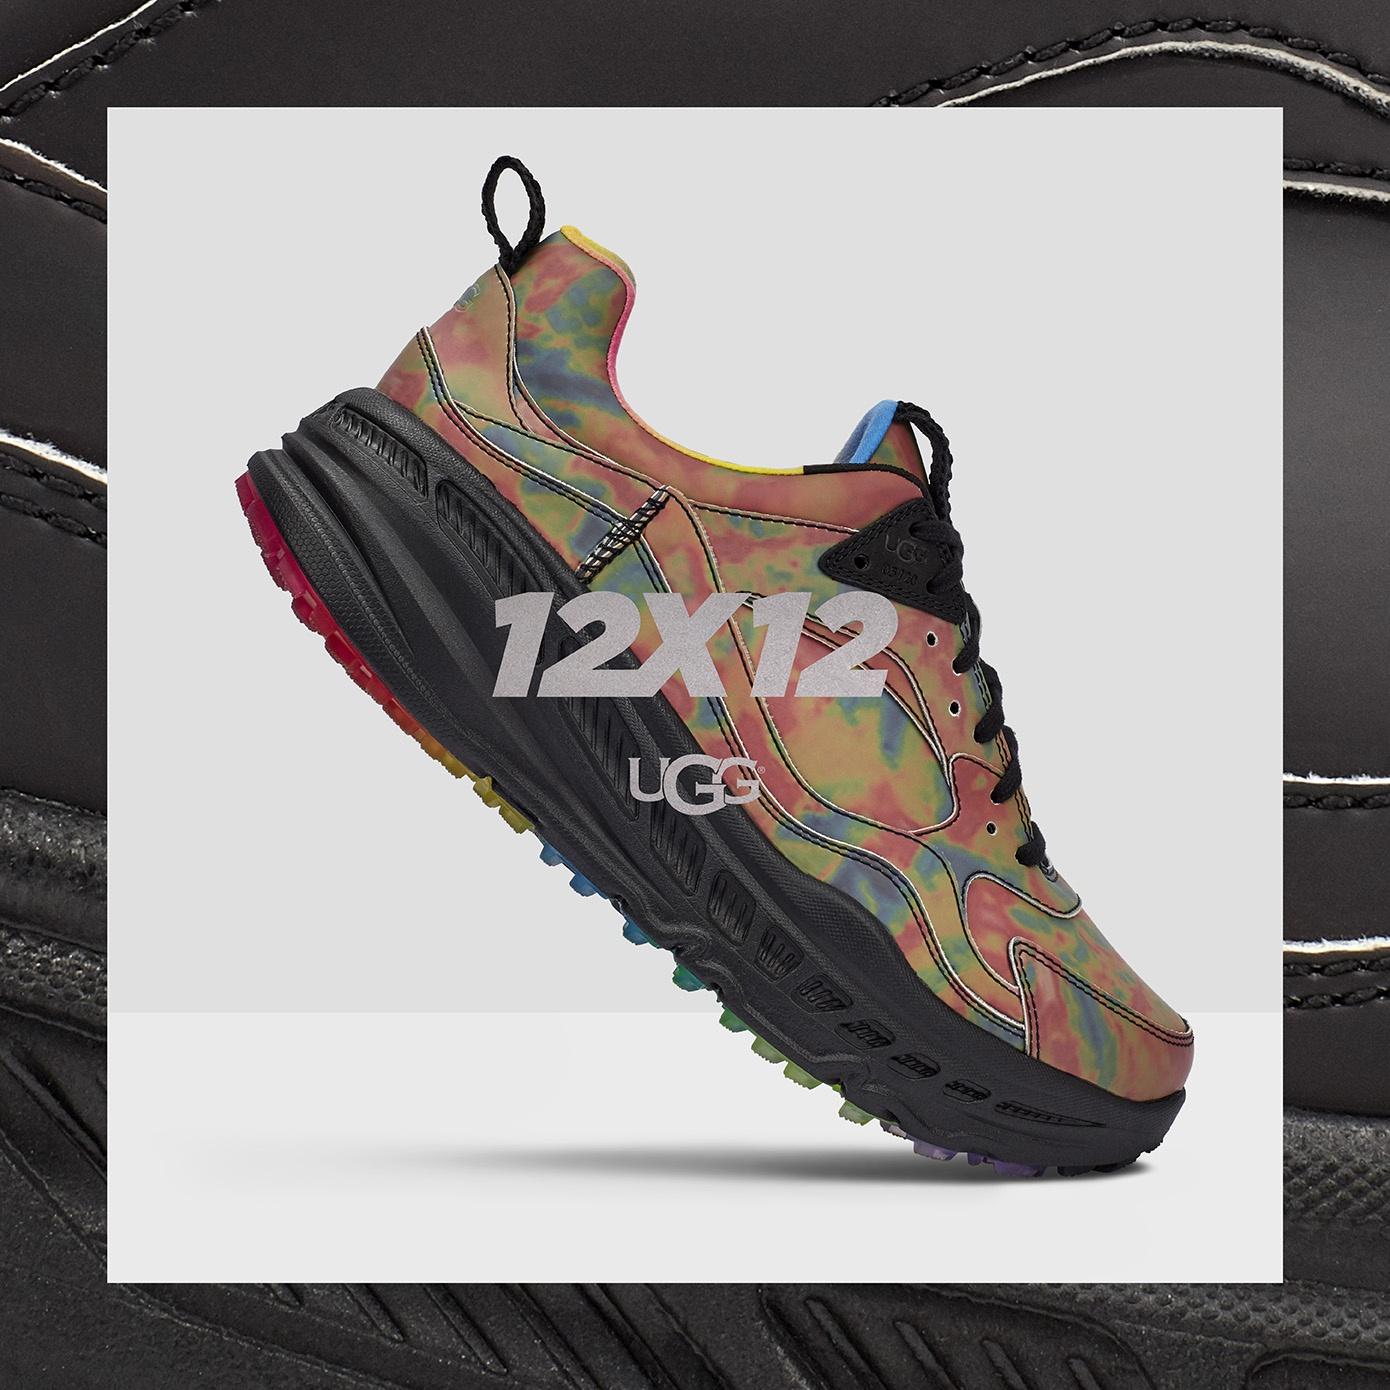 "UGG®12x12限量系列CA805 x 热感运动鞋正式发售——颠覆性引入硅谷创新科技,为温度而""改变"""